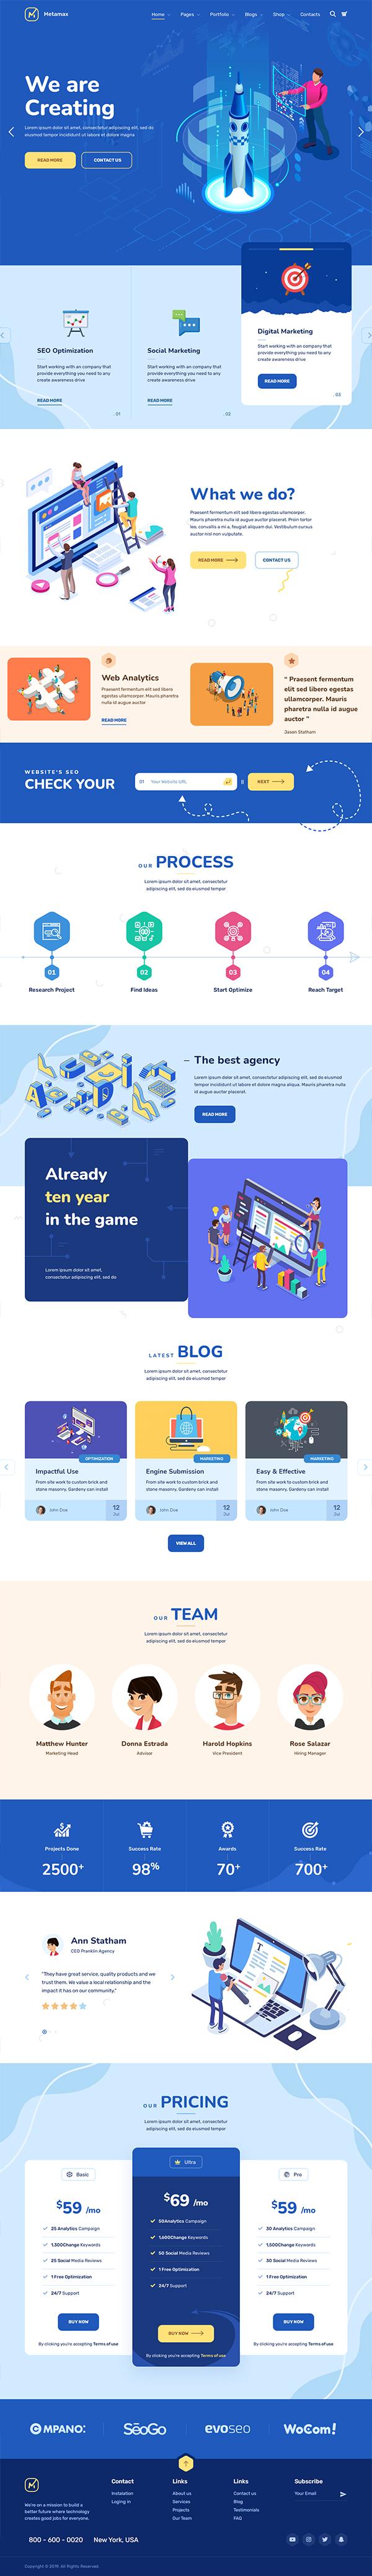 MetaMax - SEO and Marketing WordPress Theme